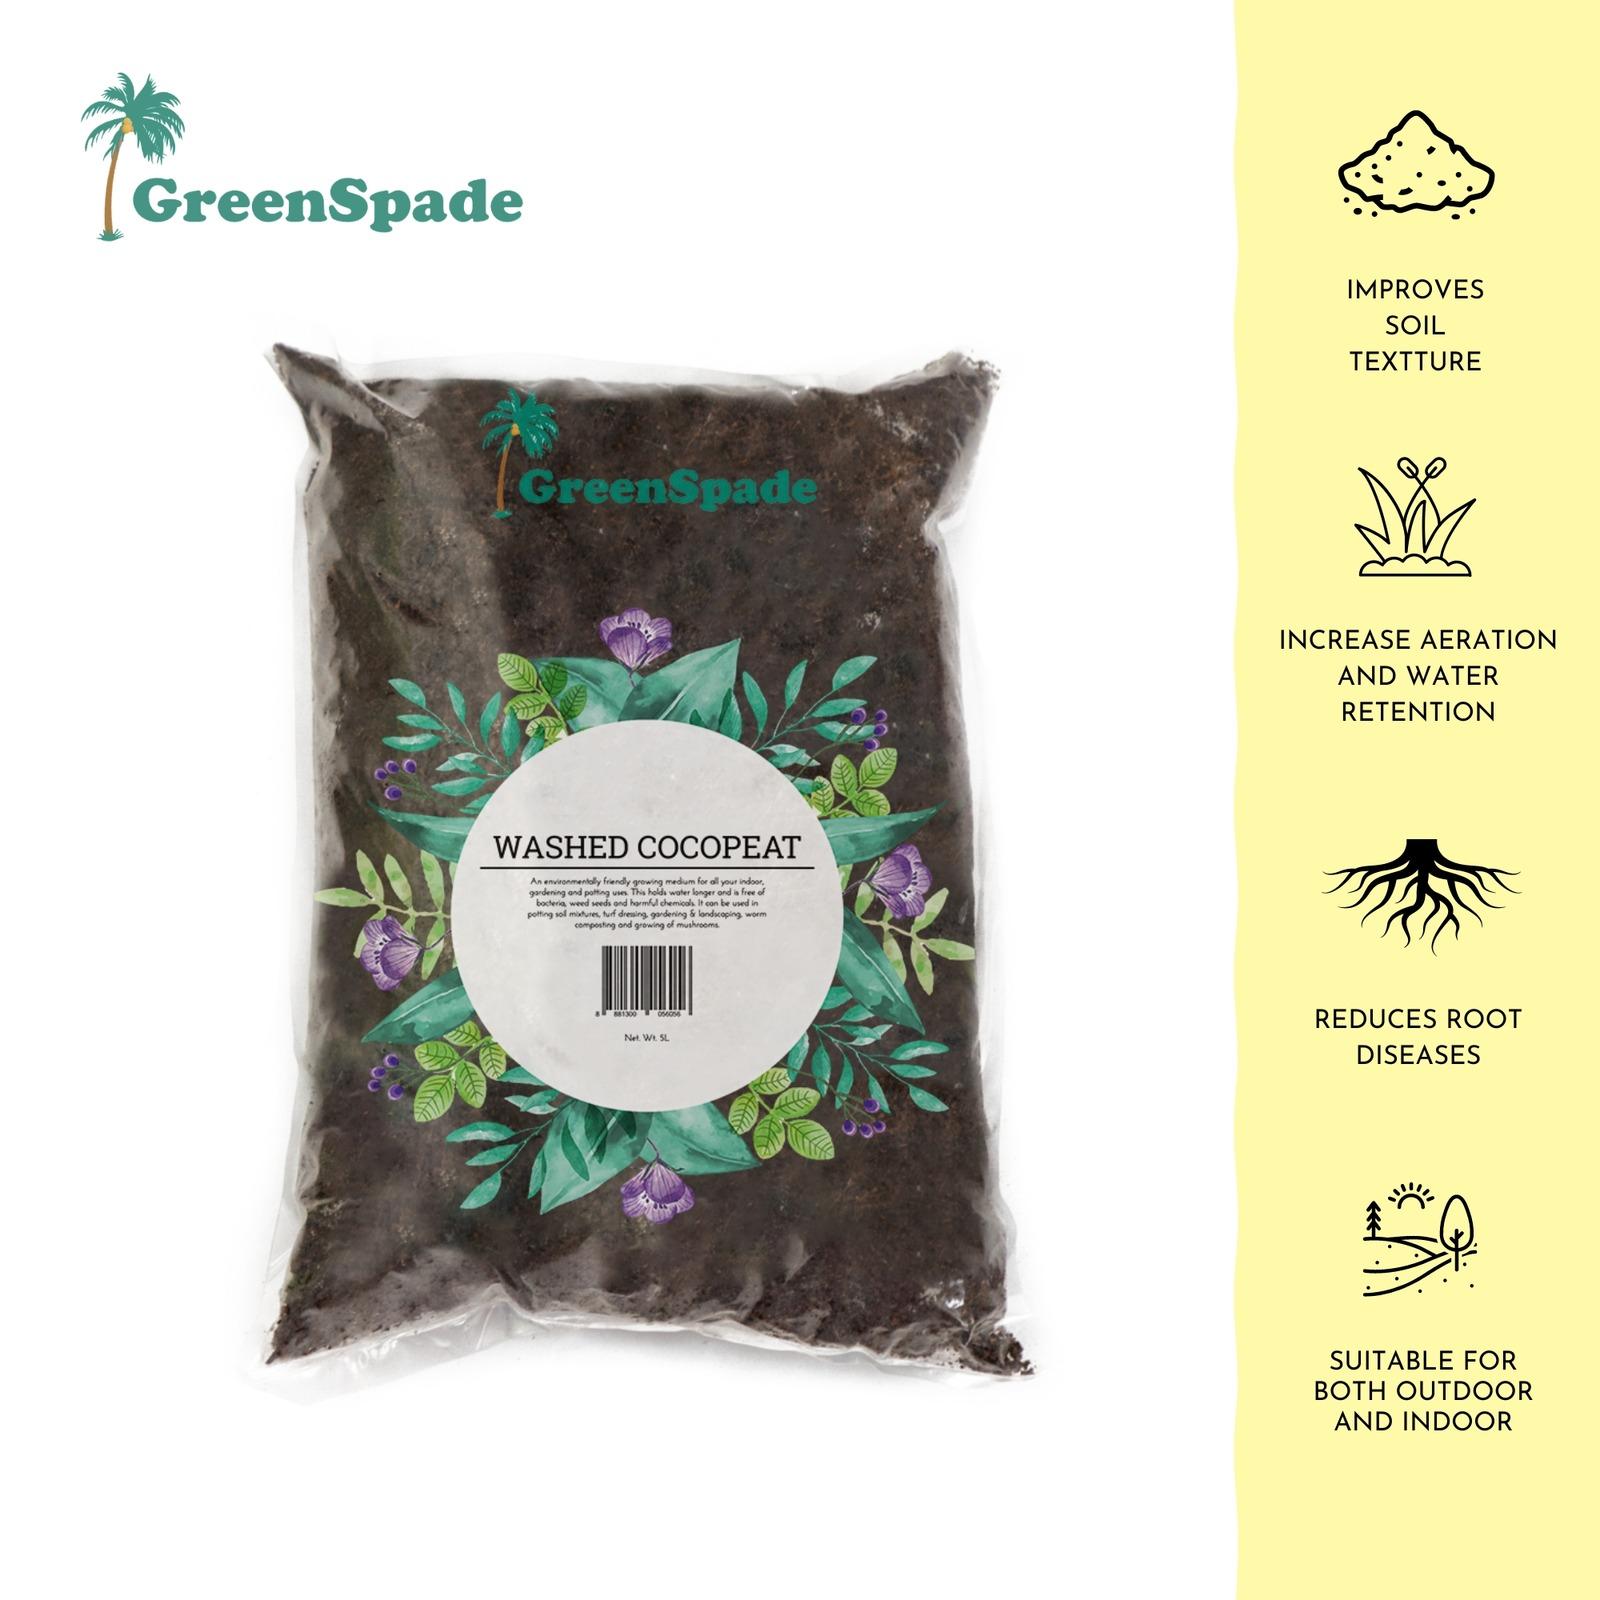 GreenSpade Washed Cocopeat - Low EC